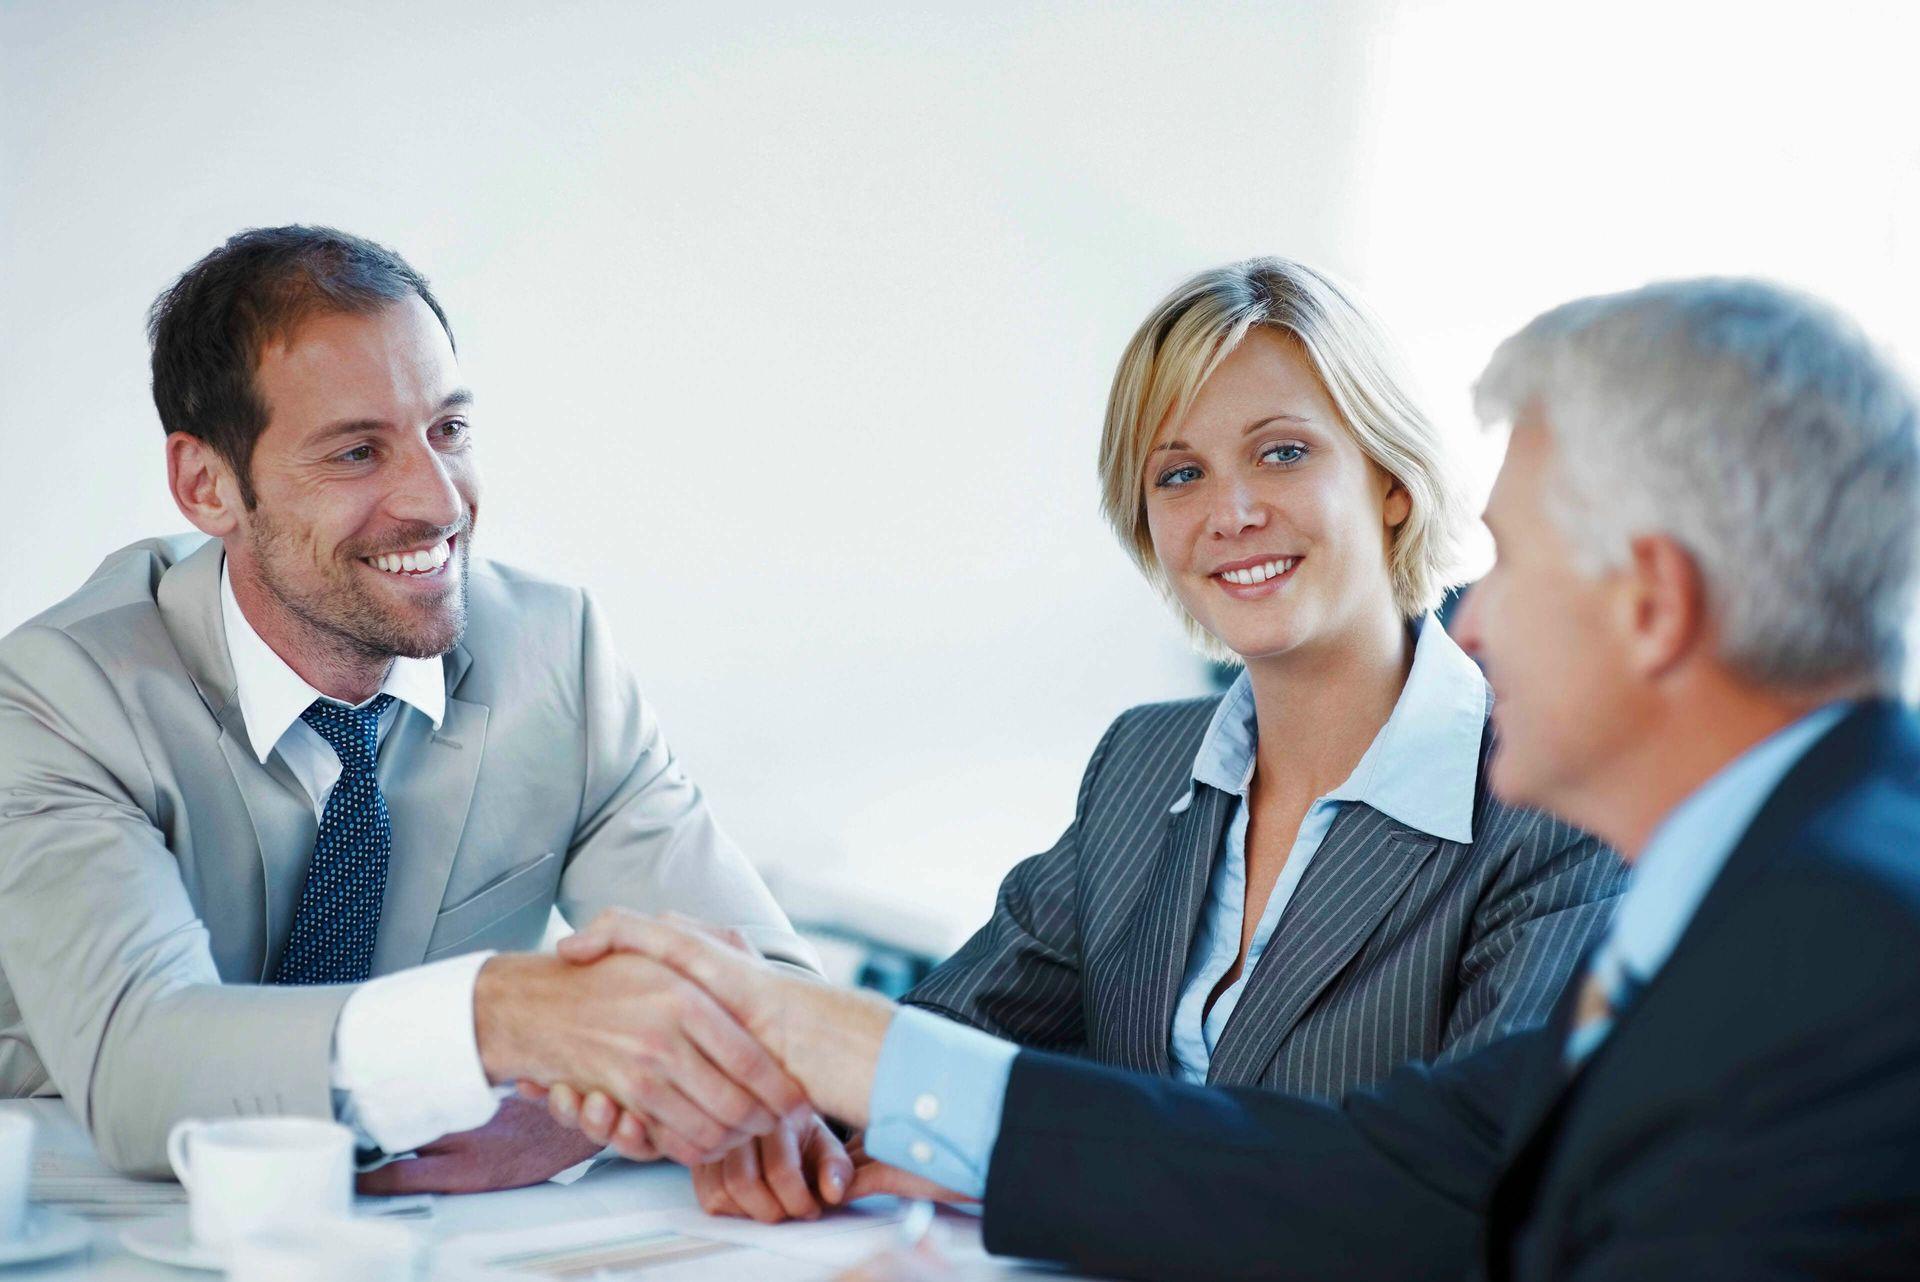 business-loans-and-finance-business-loans-nab-bank-guarantee-finance